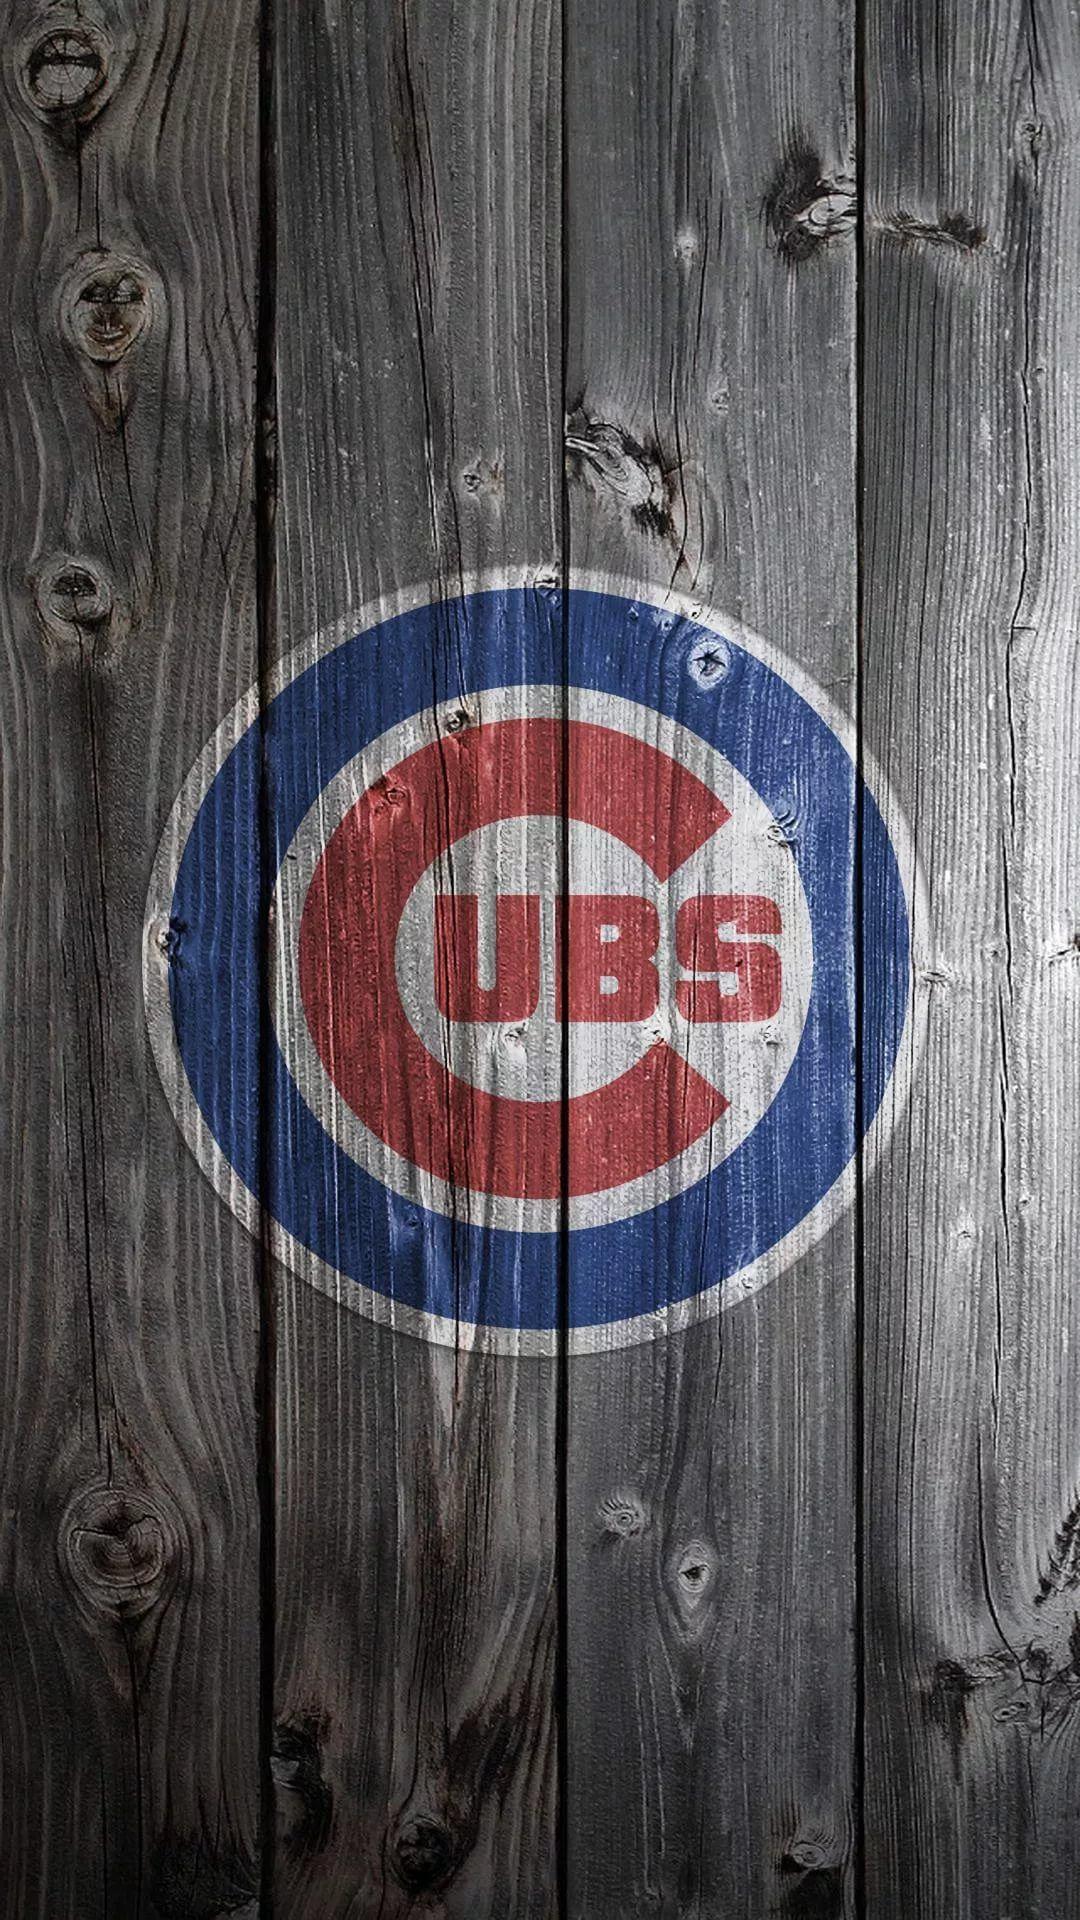 Cubs Iphone Wallpaper : iphone, wallpaper, Chicago, IPhone, Wallpapers:, Images, WallpaperBoat